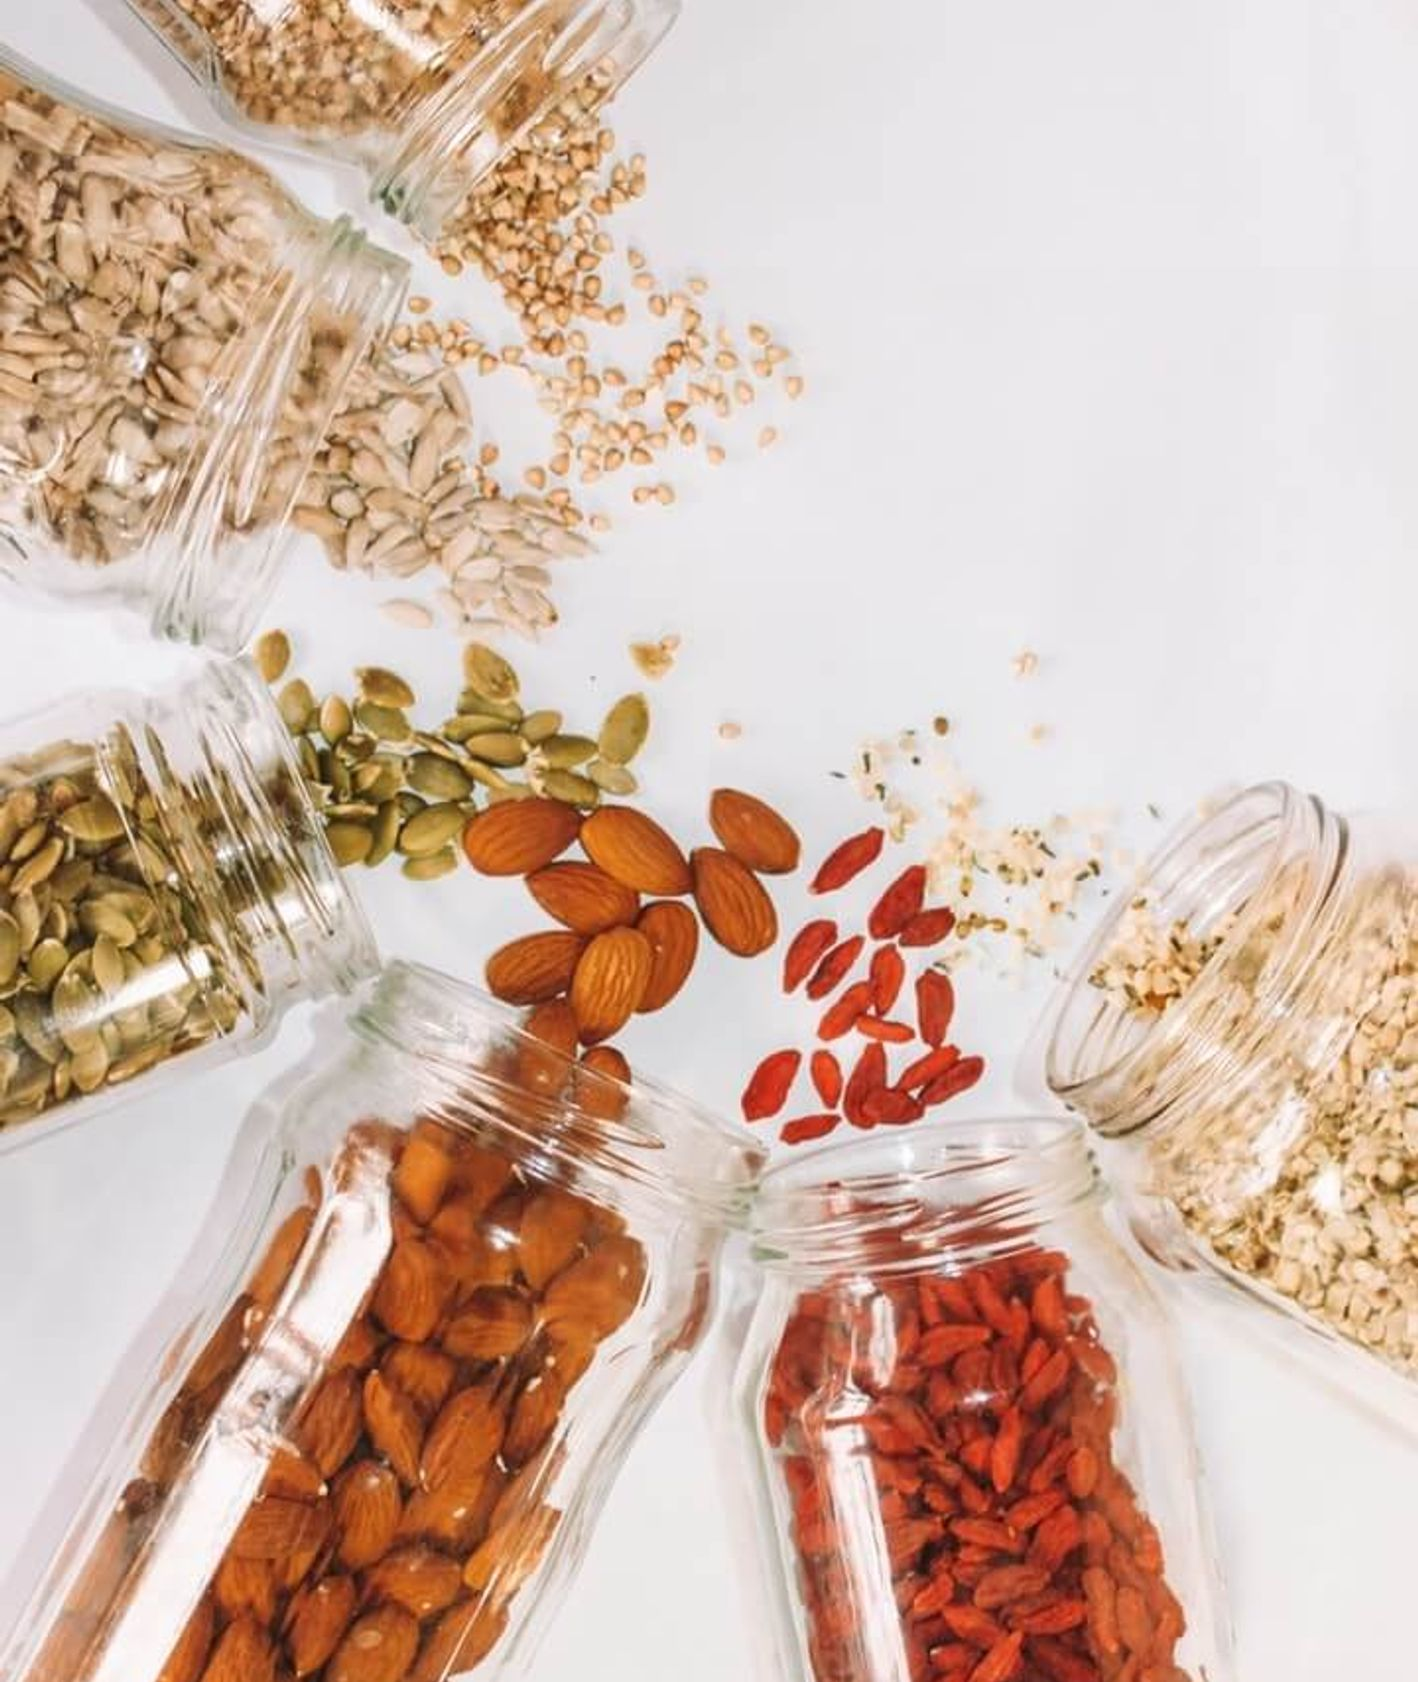 superfood, superfoods, jagody goji, goji seeds, kukbuk na trope, zdrowa żywność, prawda o super foods